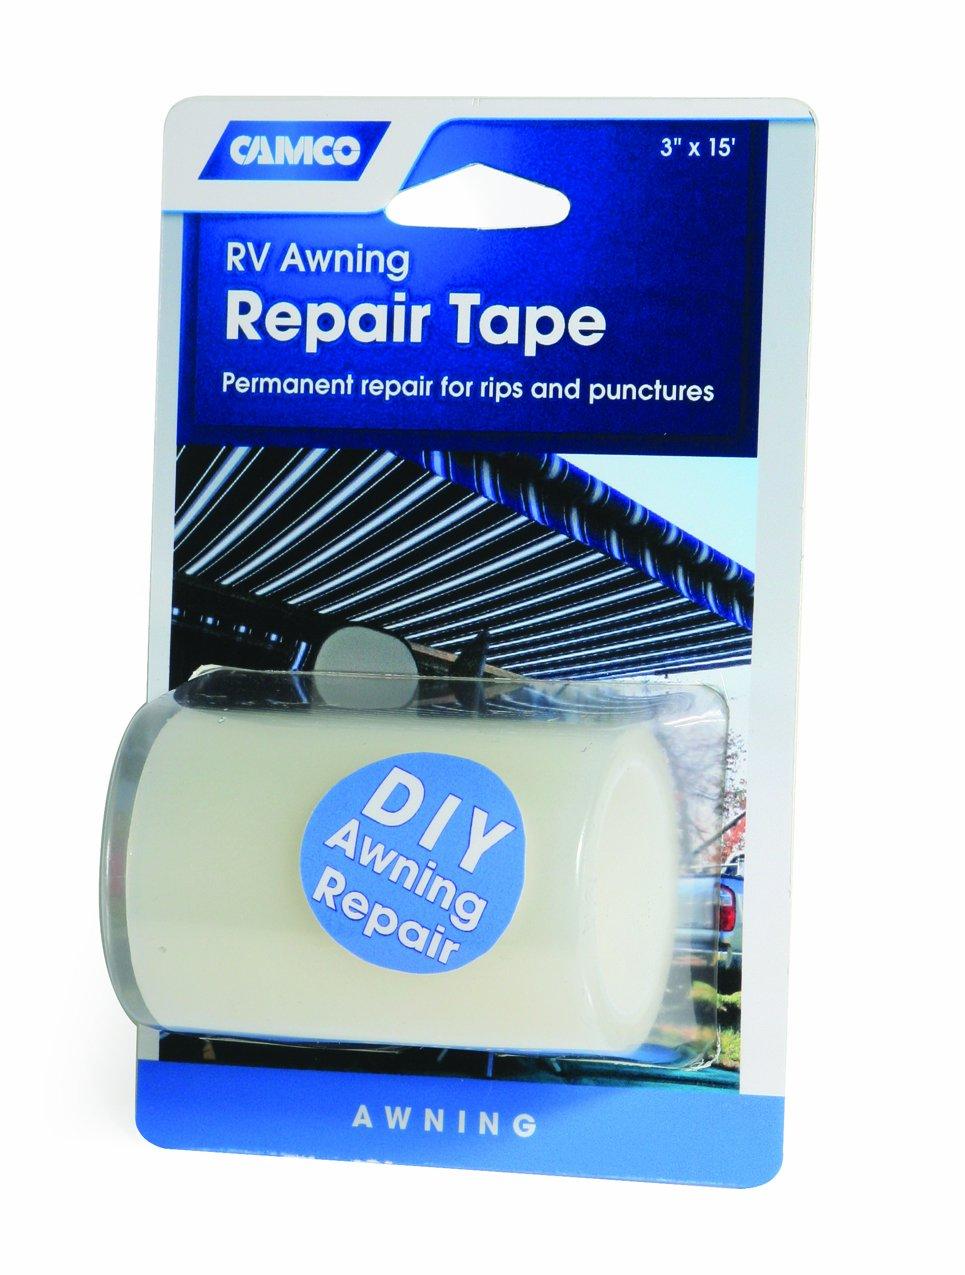 Camco Awning Repair tape